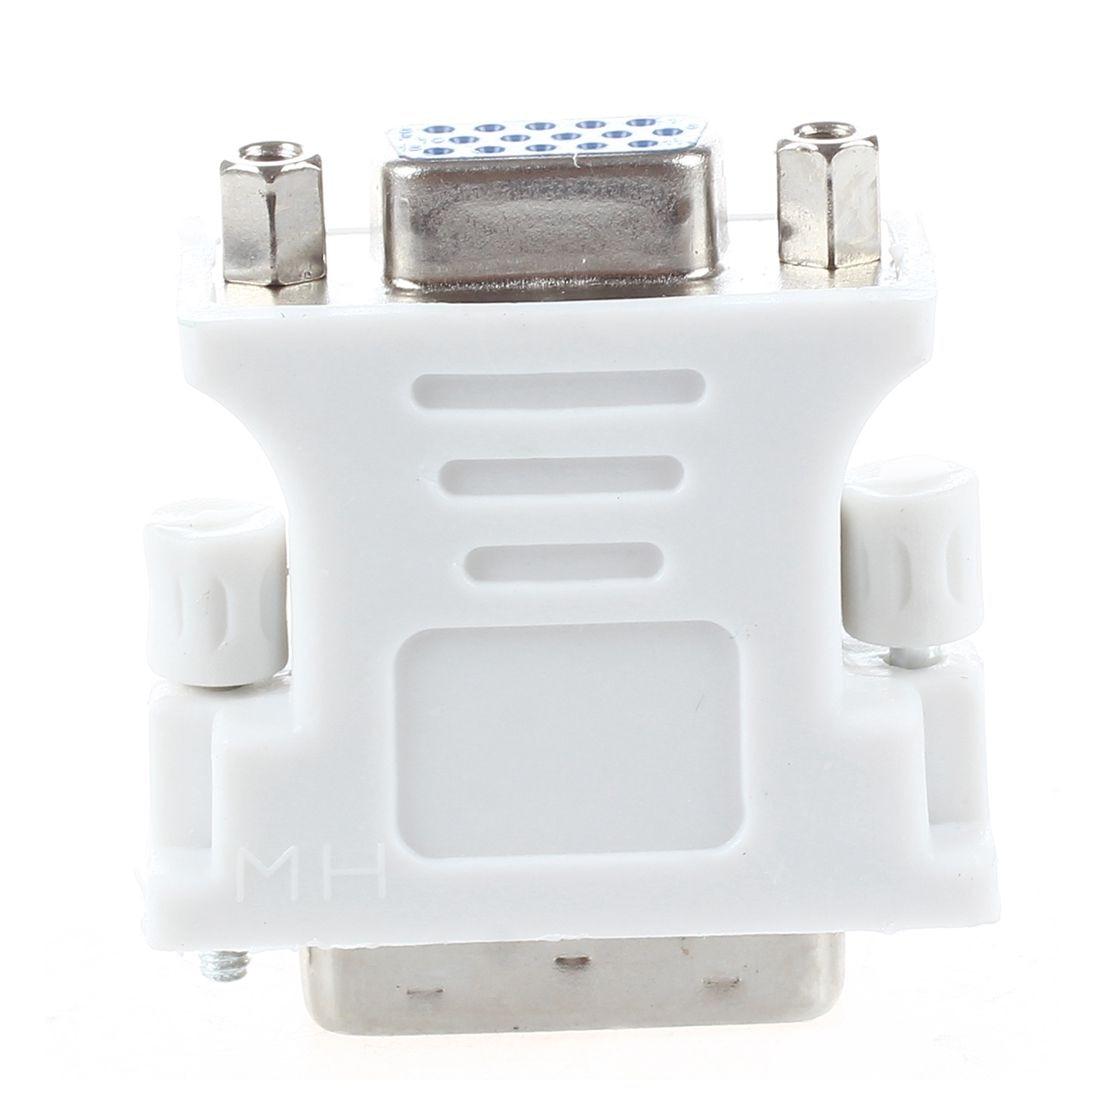 DVI male adapter (DVI - D 24 1) to female VGA (15-pin) new dvi male adapter dvi d 24 1 to female vga 15 pin